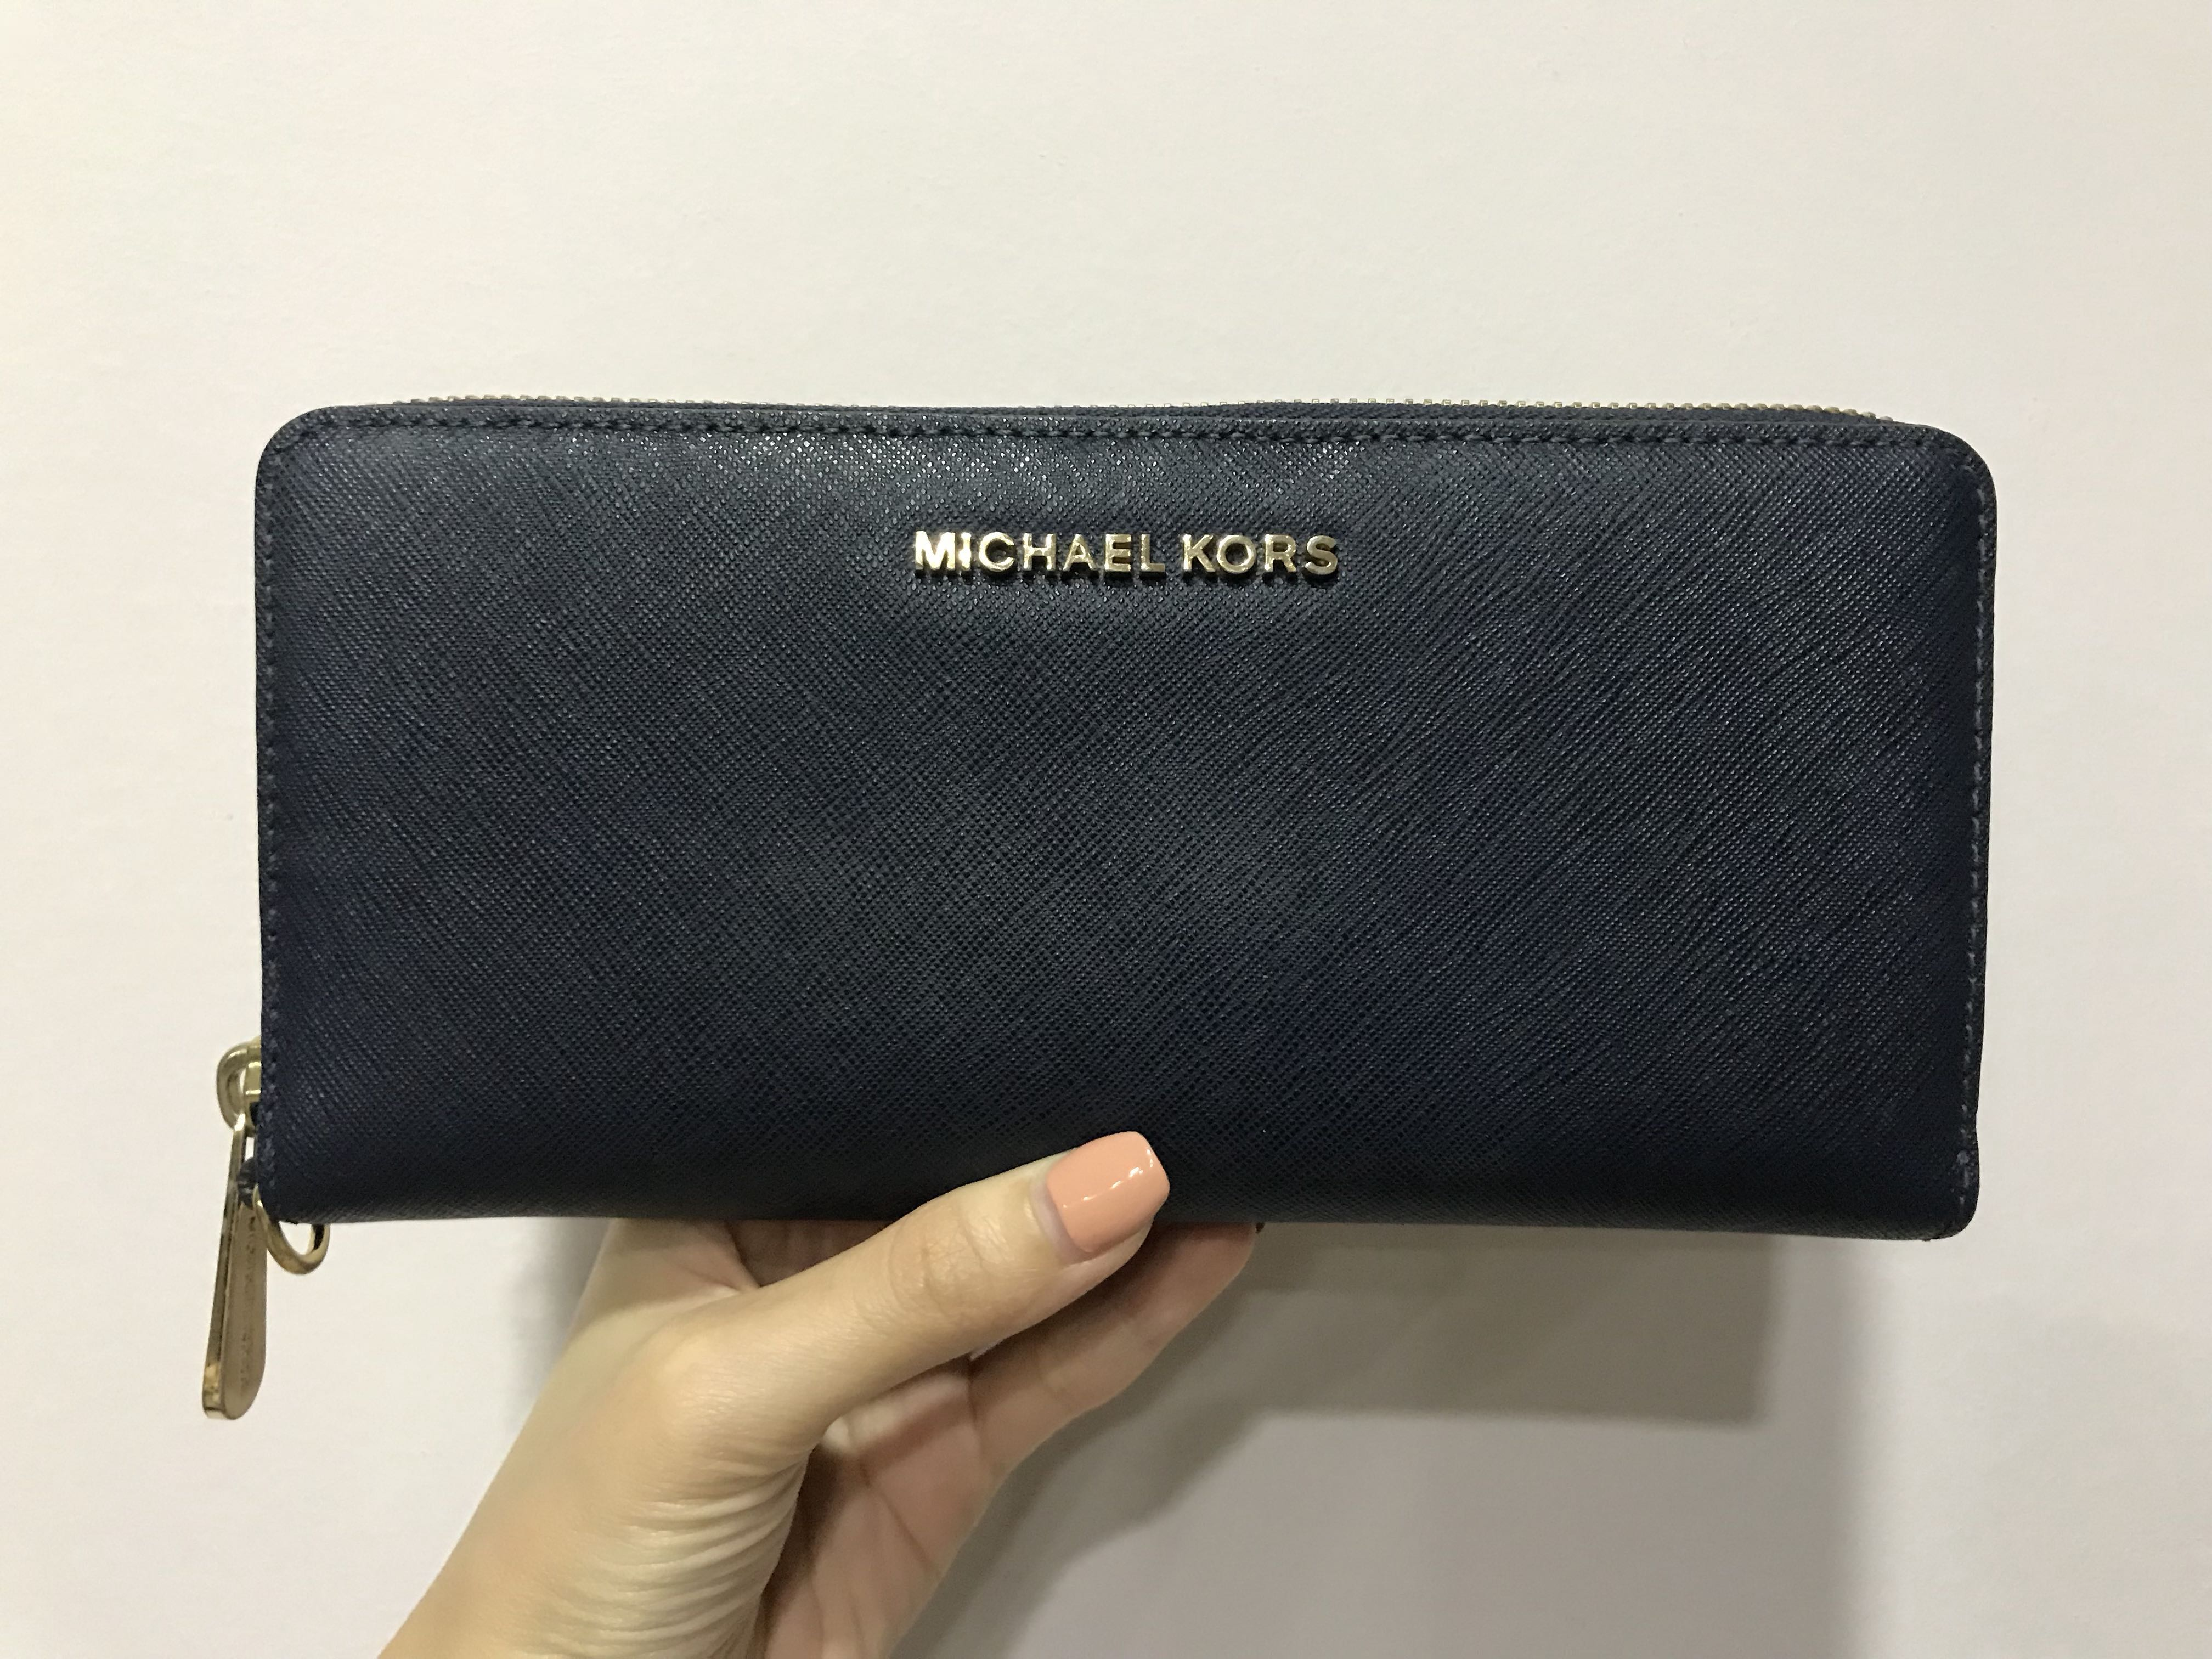 87a56d8e3a55 Michael Kors Jet Set Travel Leather Continental Wallet